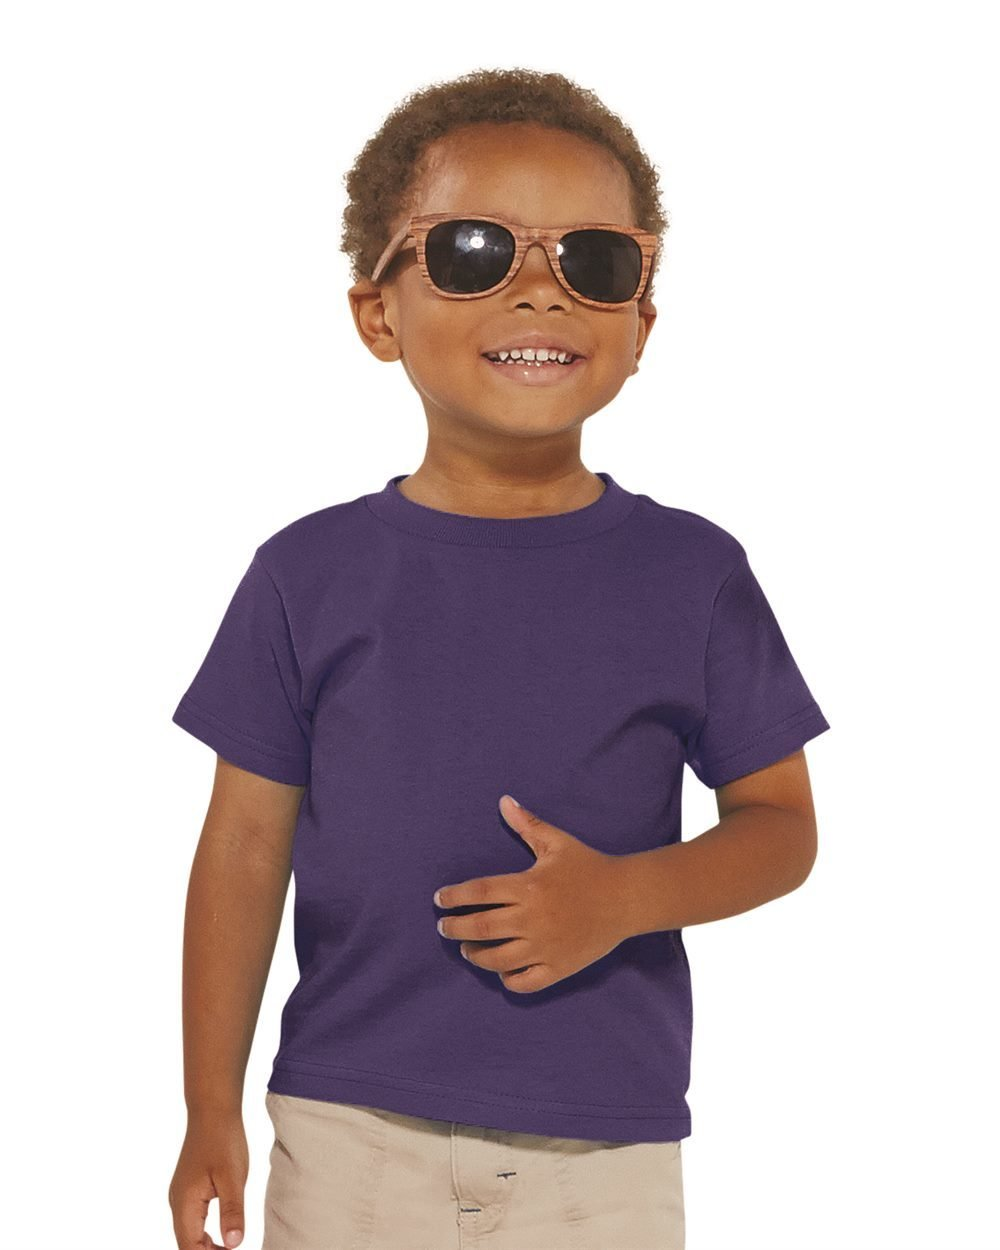 Toddler Cotton Jersy Tee - (STYLE#STLT003301)